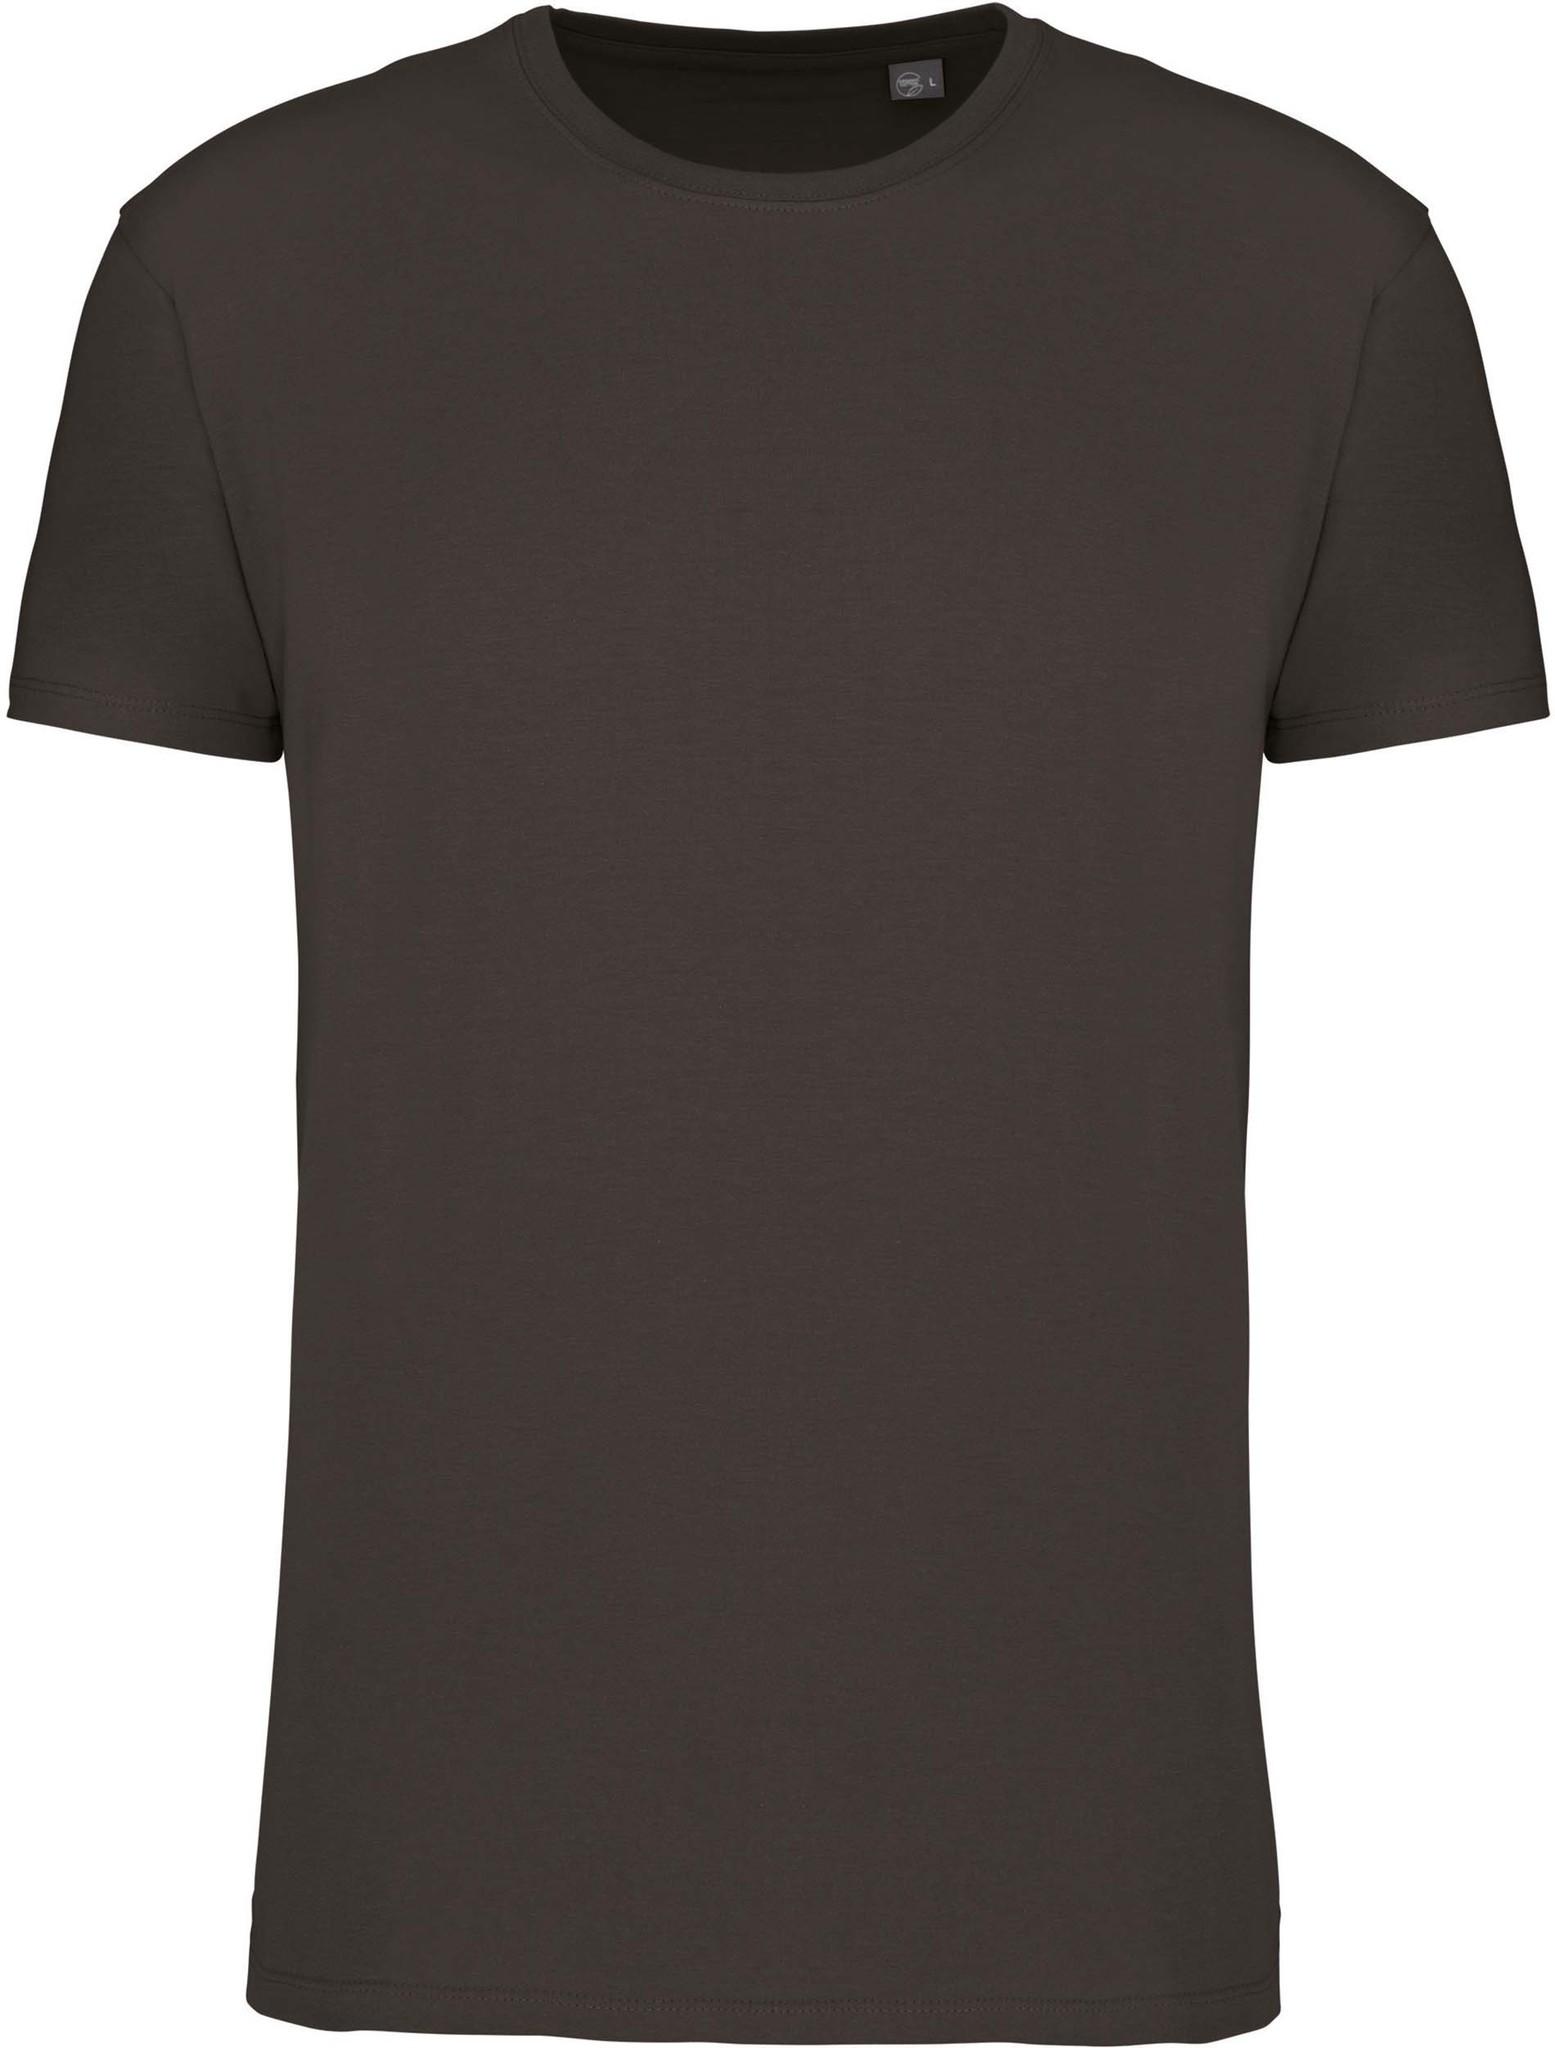 Eco-Friendly Unisex T-shirt -Dark-Grey